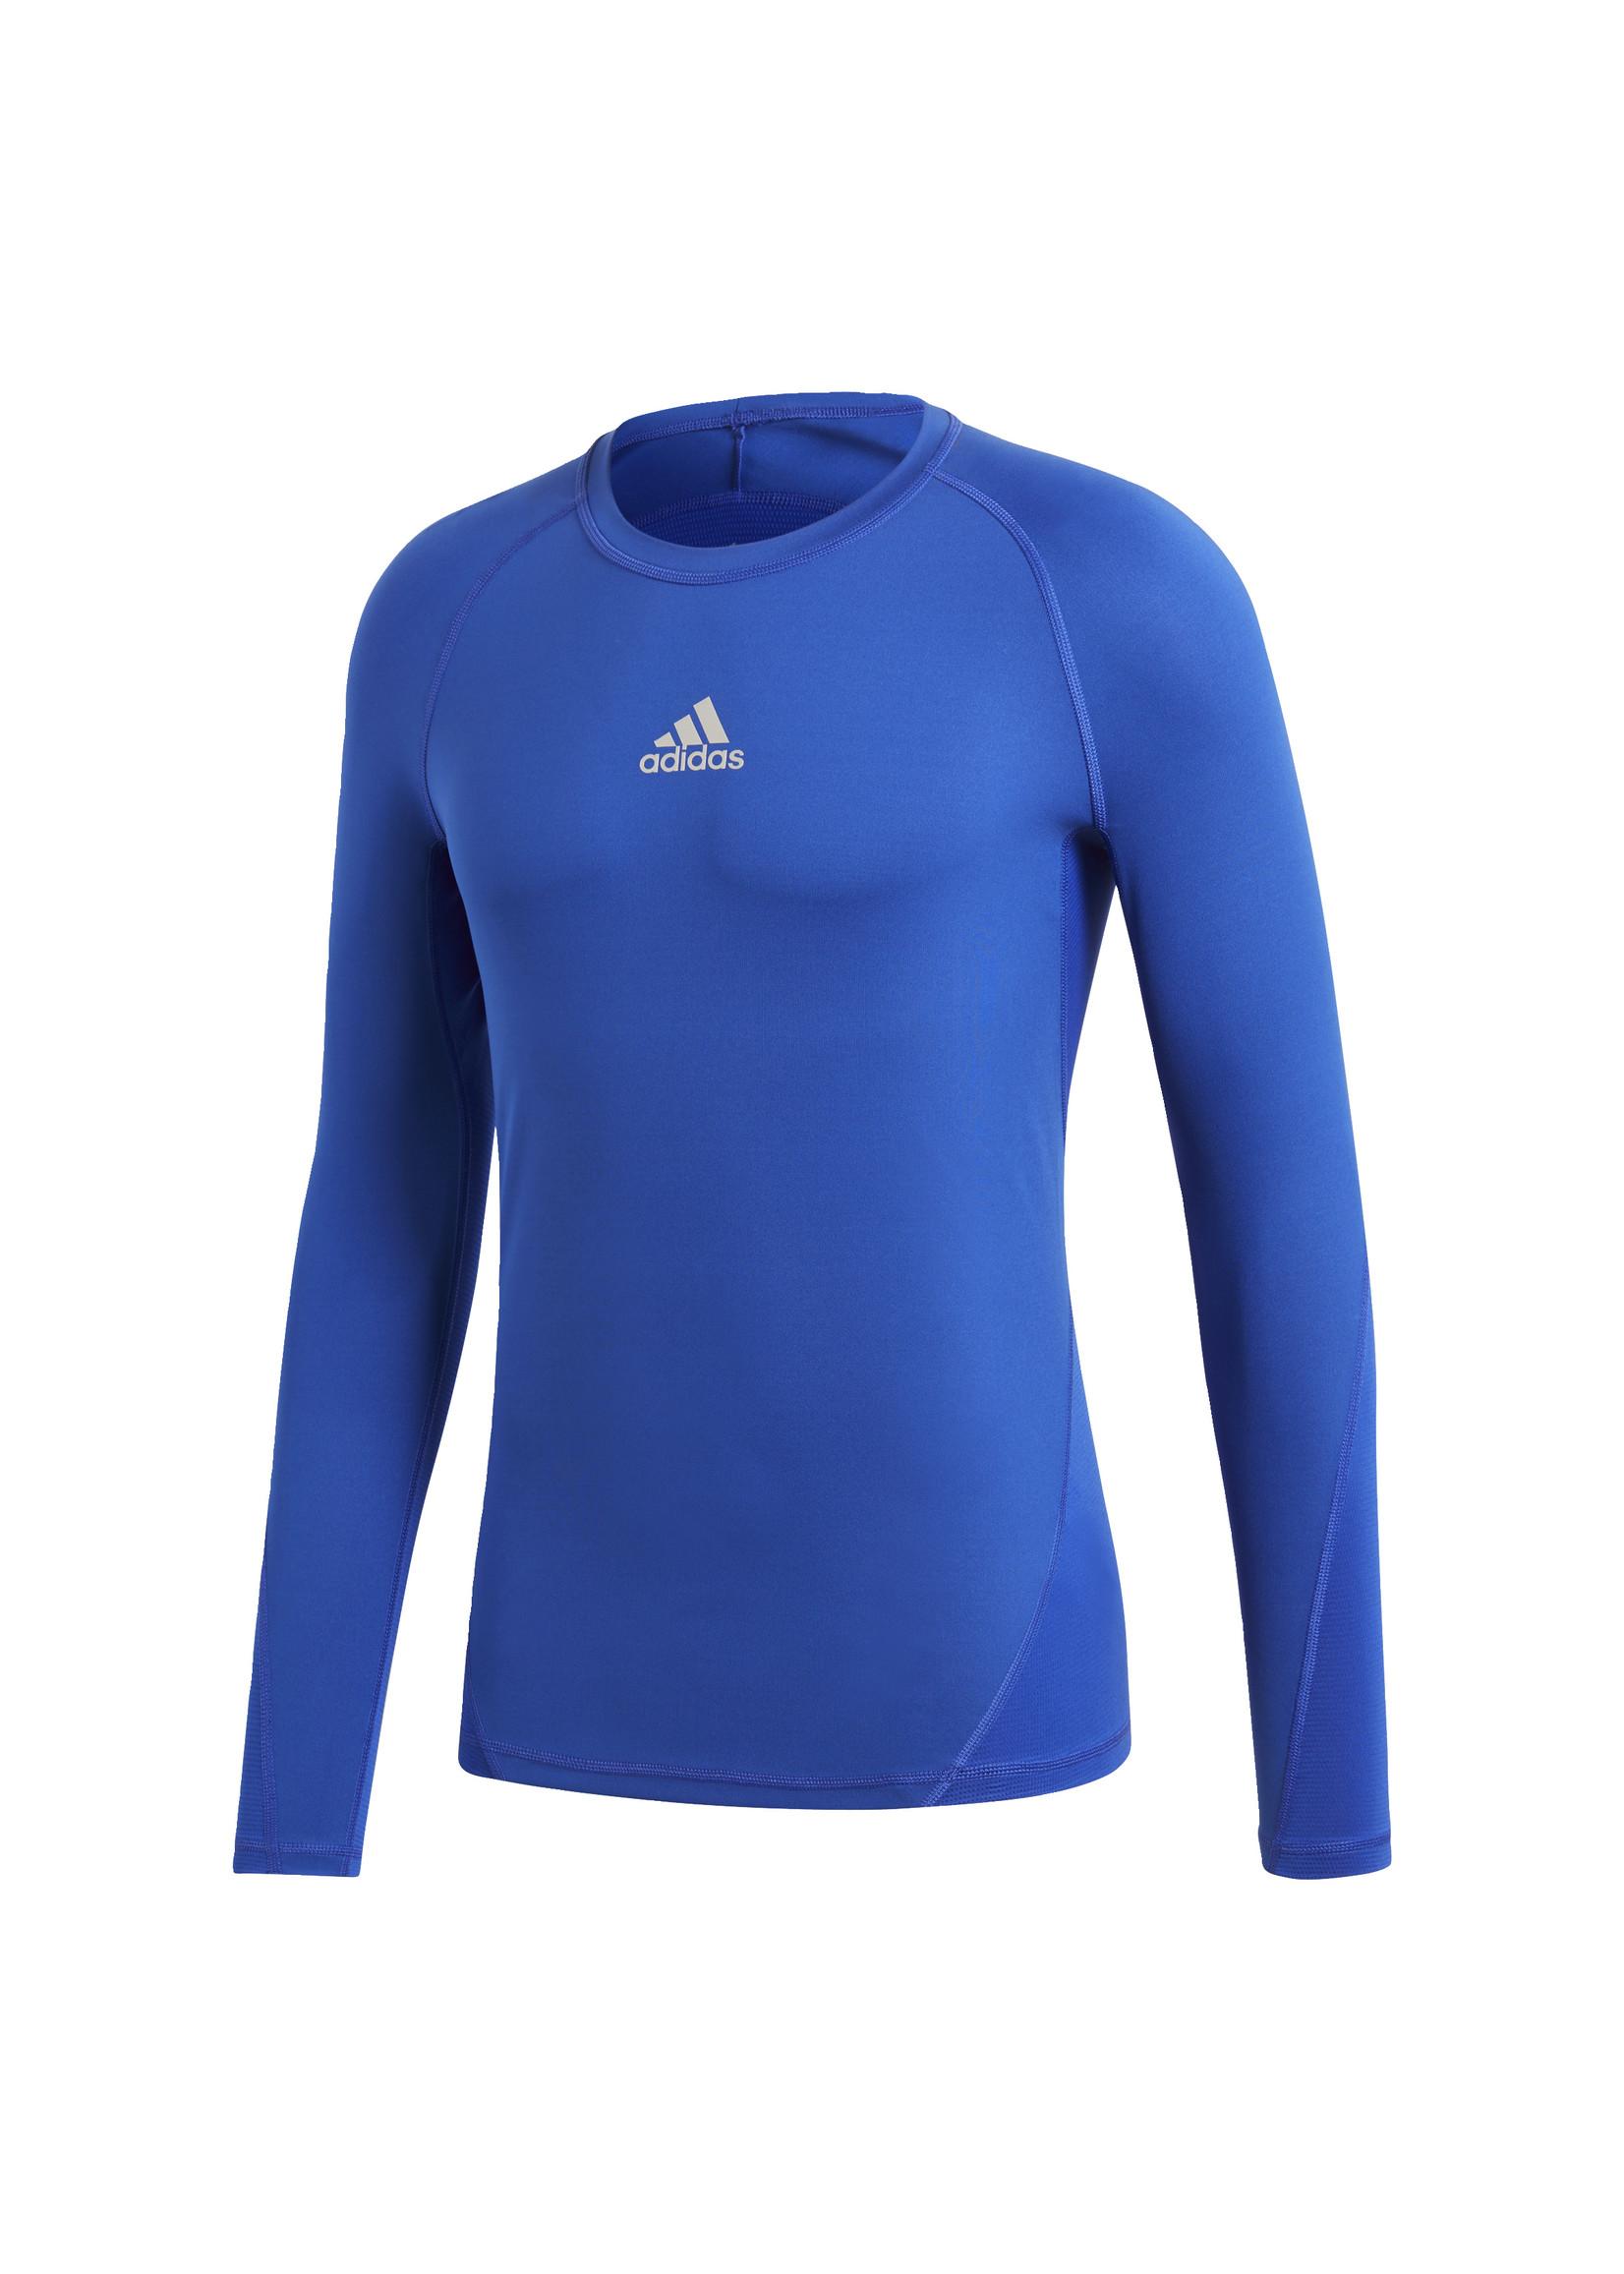 Adidas Compression Blue Long Sleeve Adult